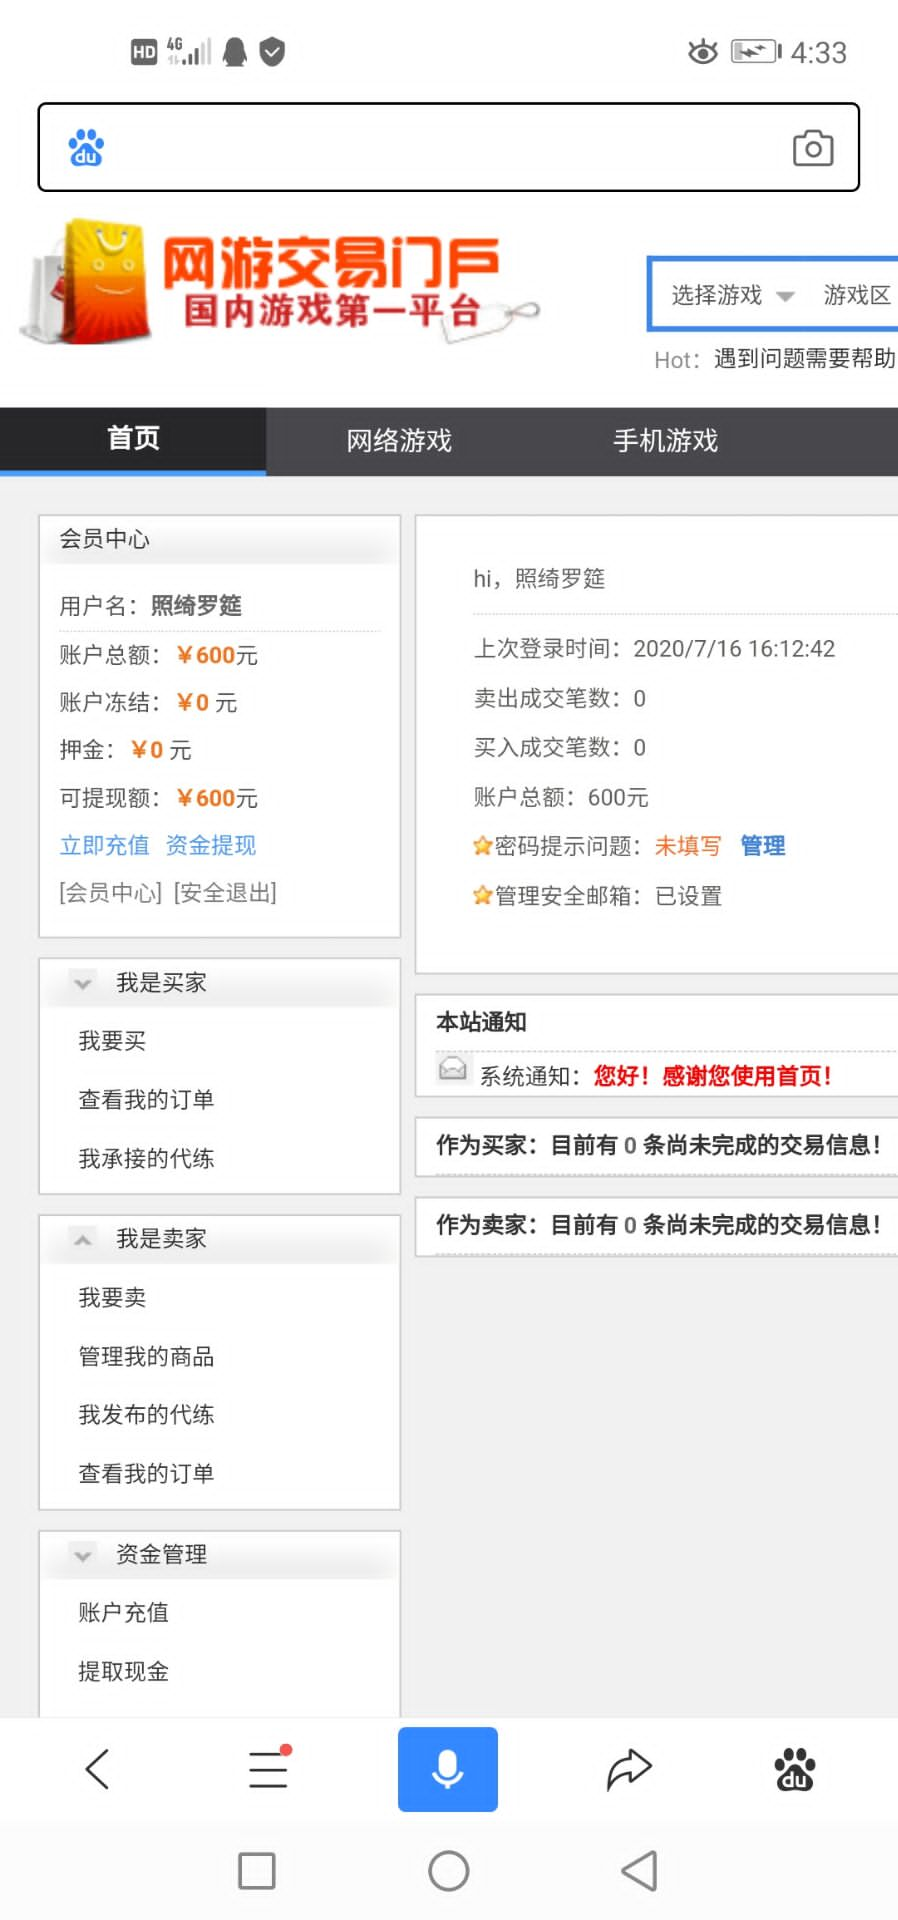 竹木类印刷B1589EBE-15898232